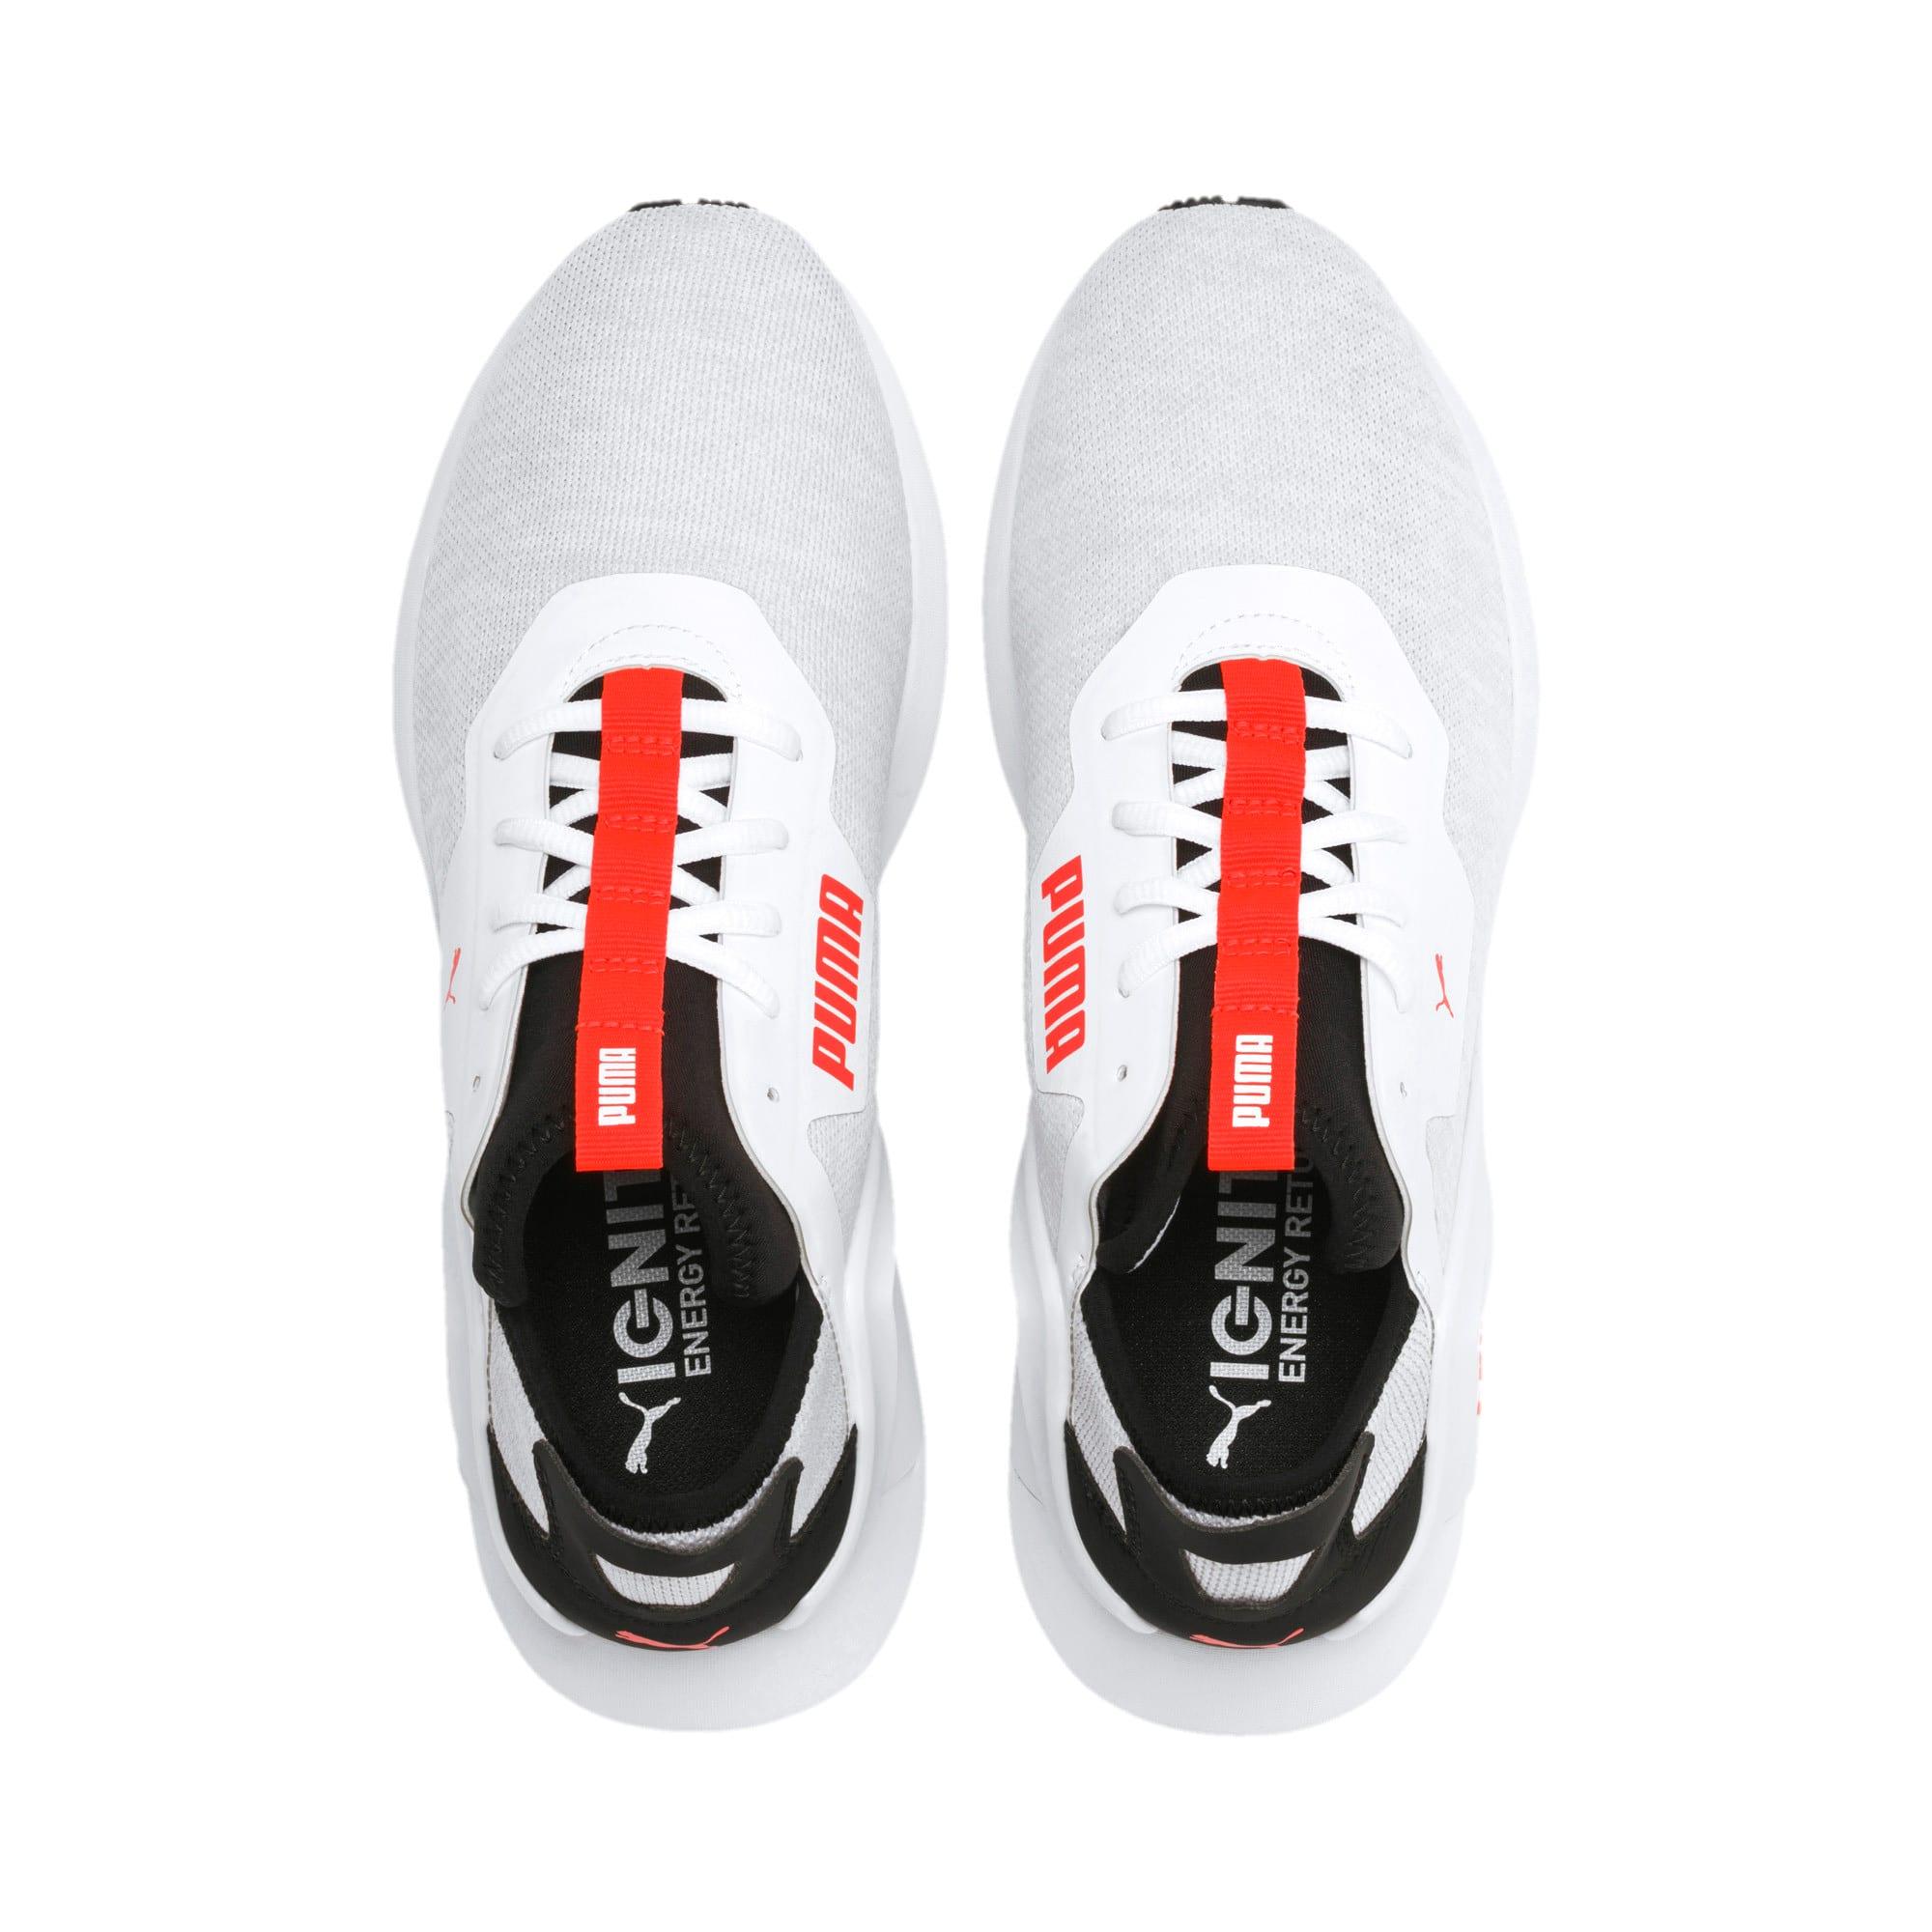 Thumbnail 7 of Rogue X Knit Herren Sneaker, White-Black-Nrgy Red, medium